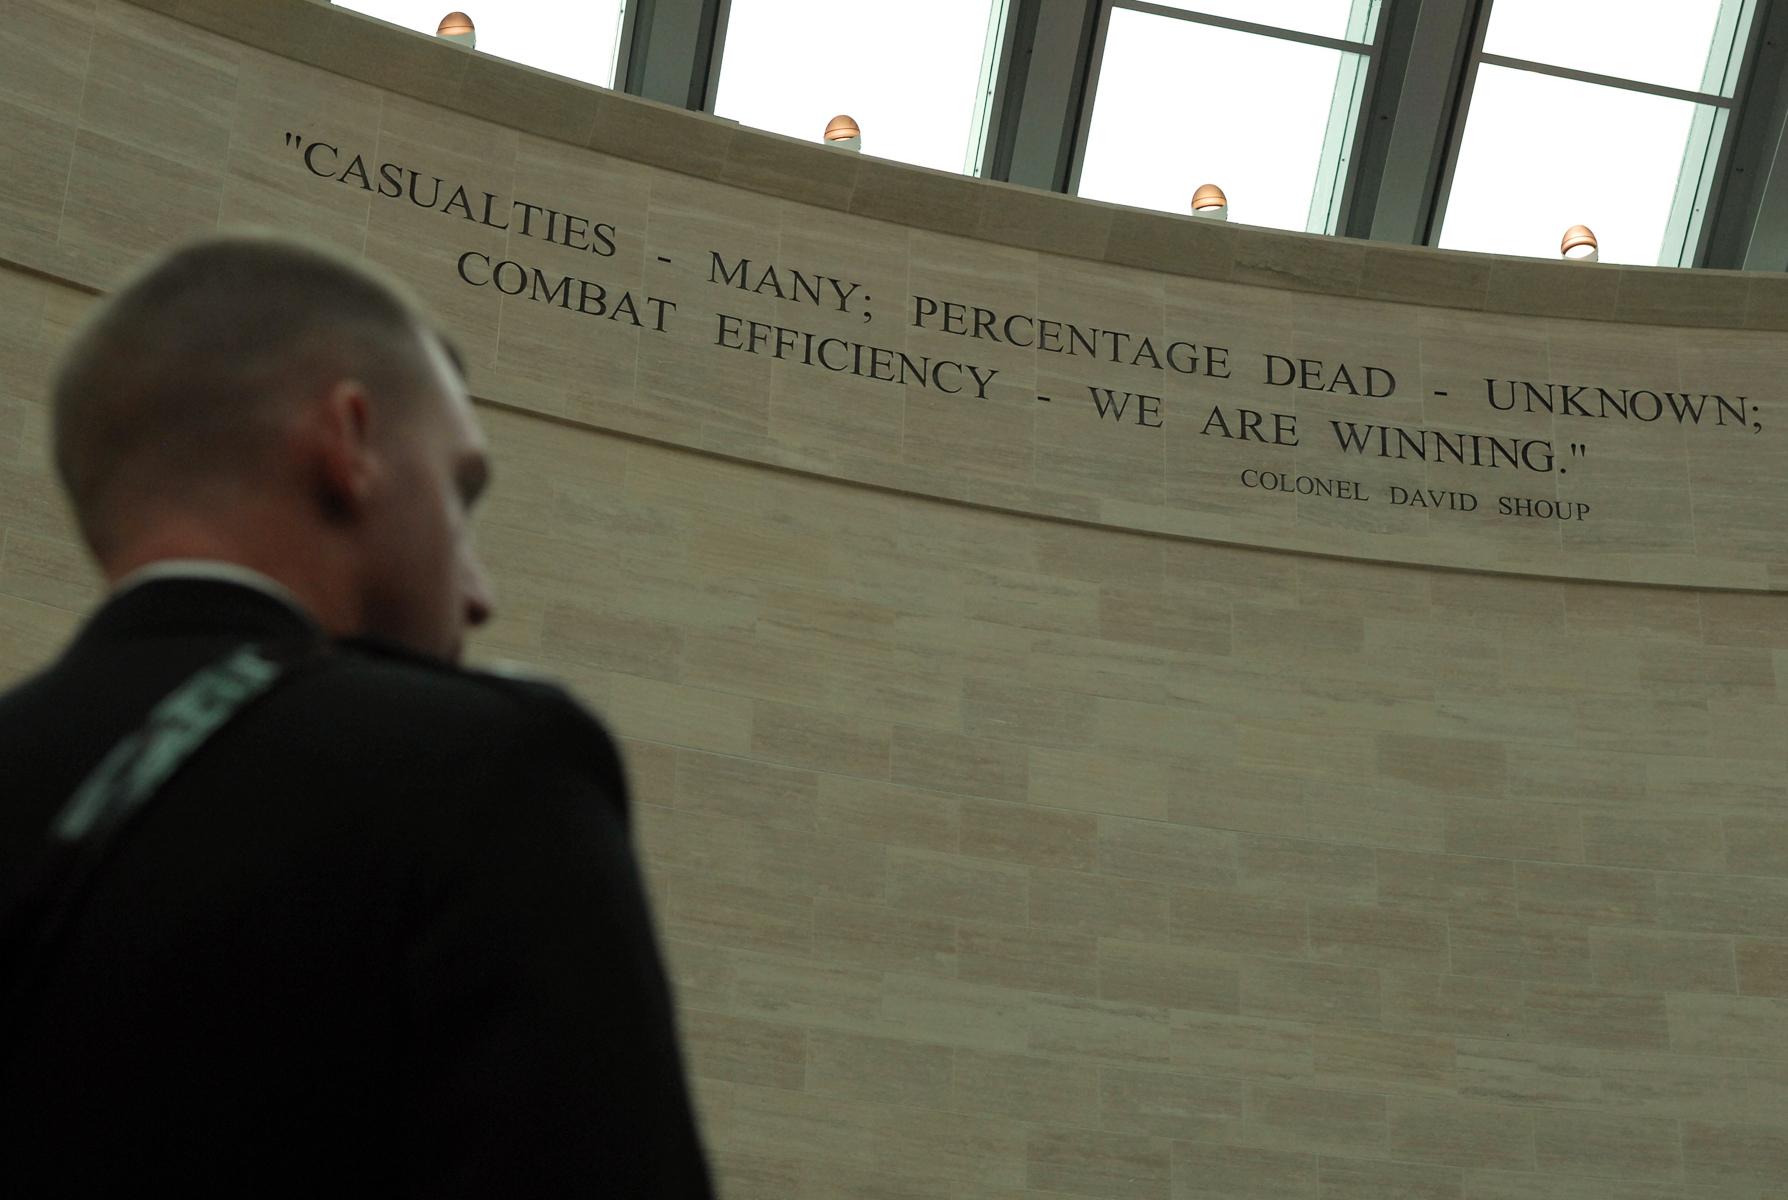 Marine Corps Quotes U.sdepartment Of Defense  Photos  Photo Gallery